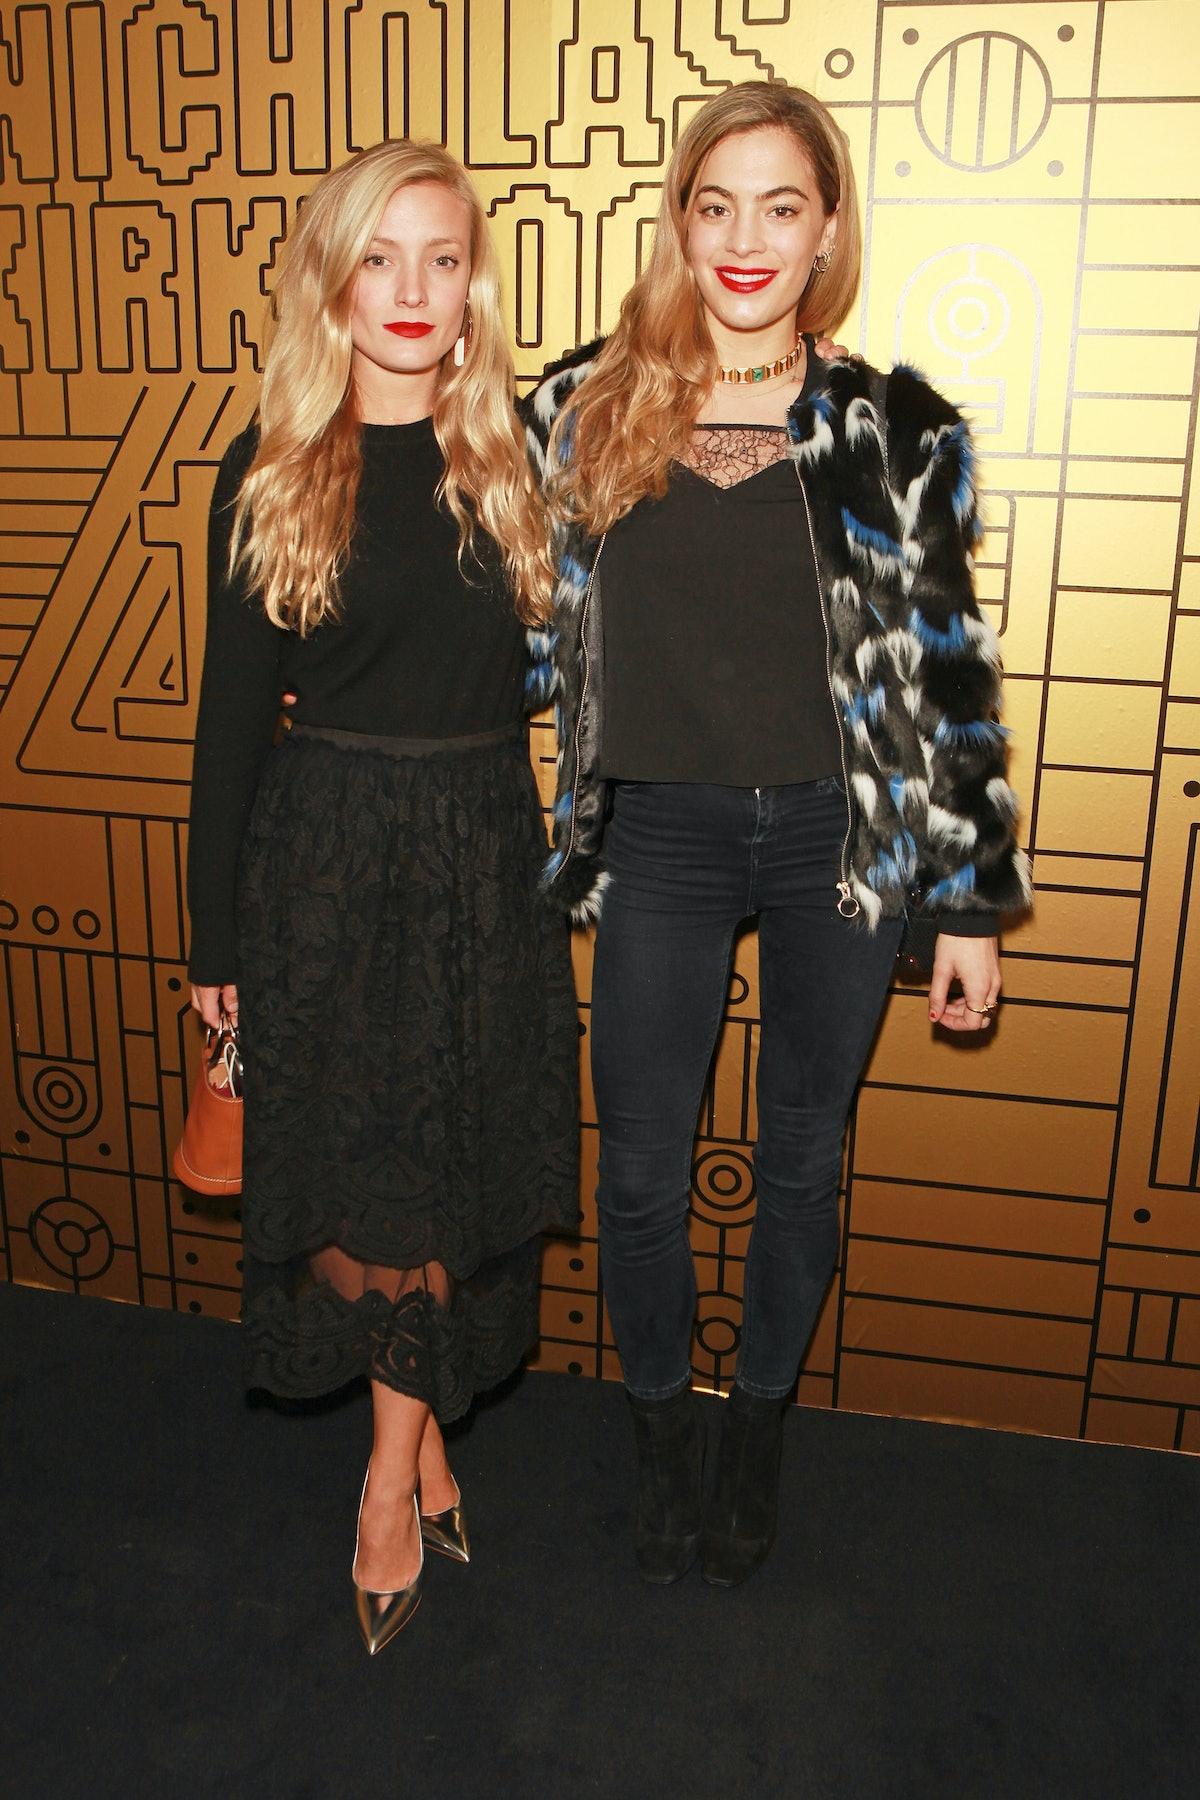 Kate Foley and Chelsea Leyland